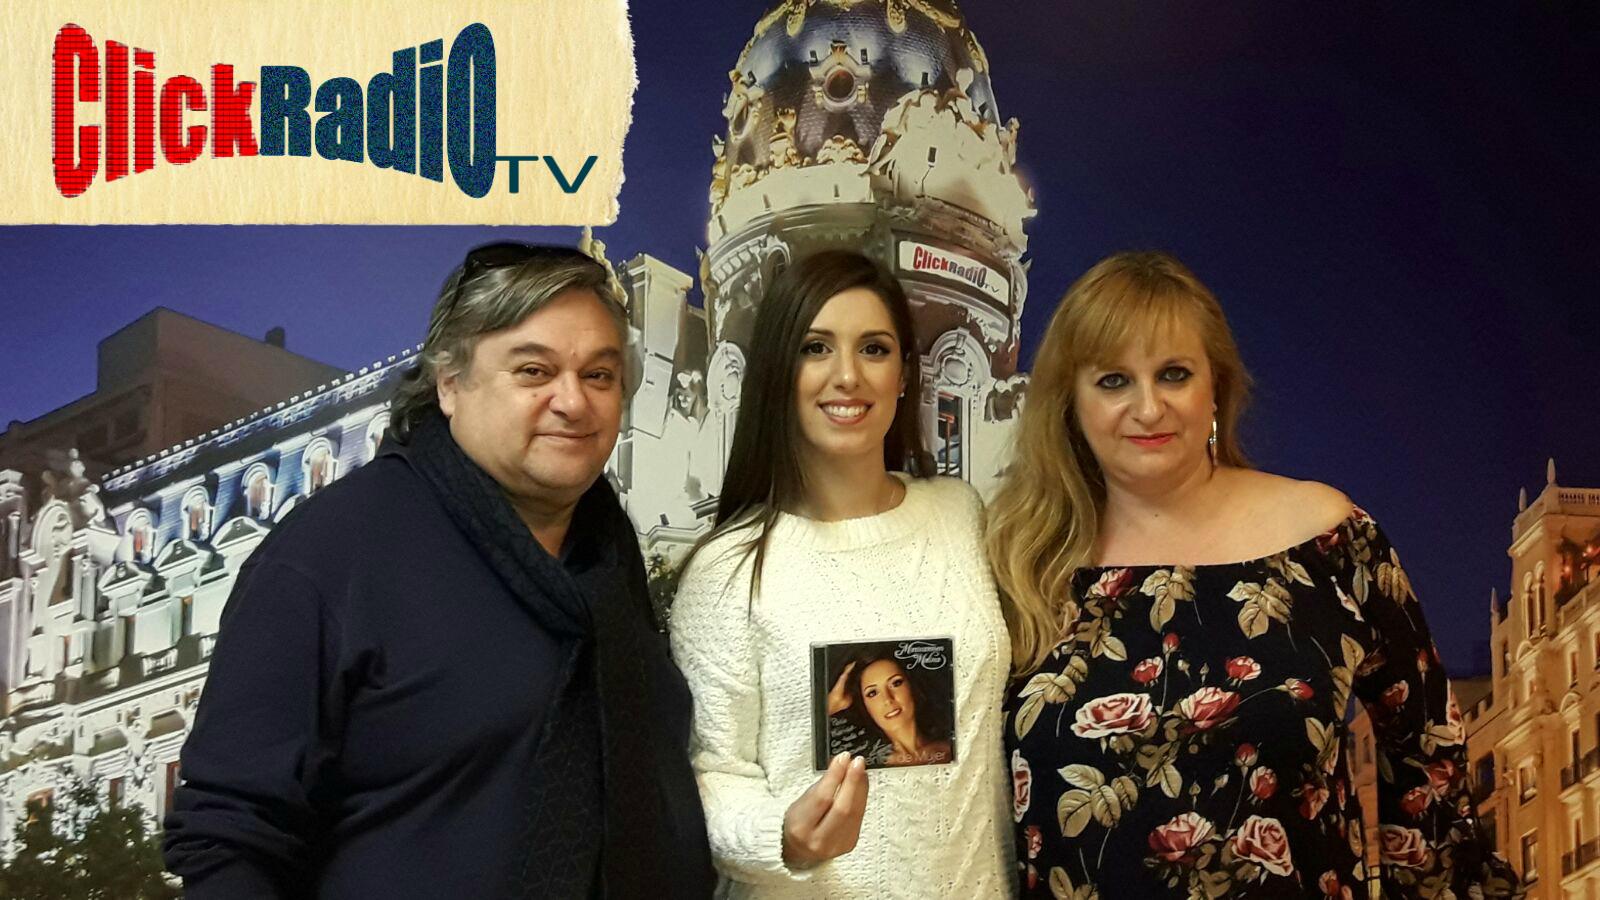 Maricarmen Molina en ClickRadio TV con Marisa Garrido